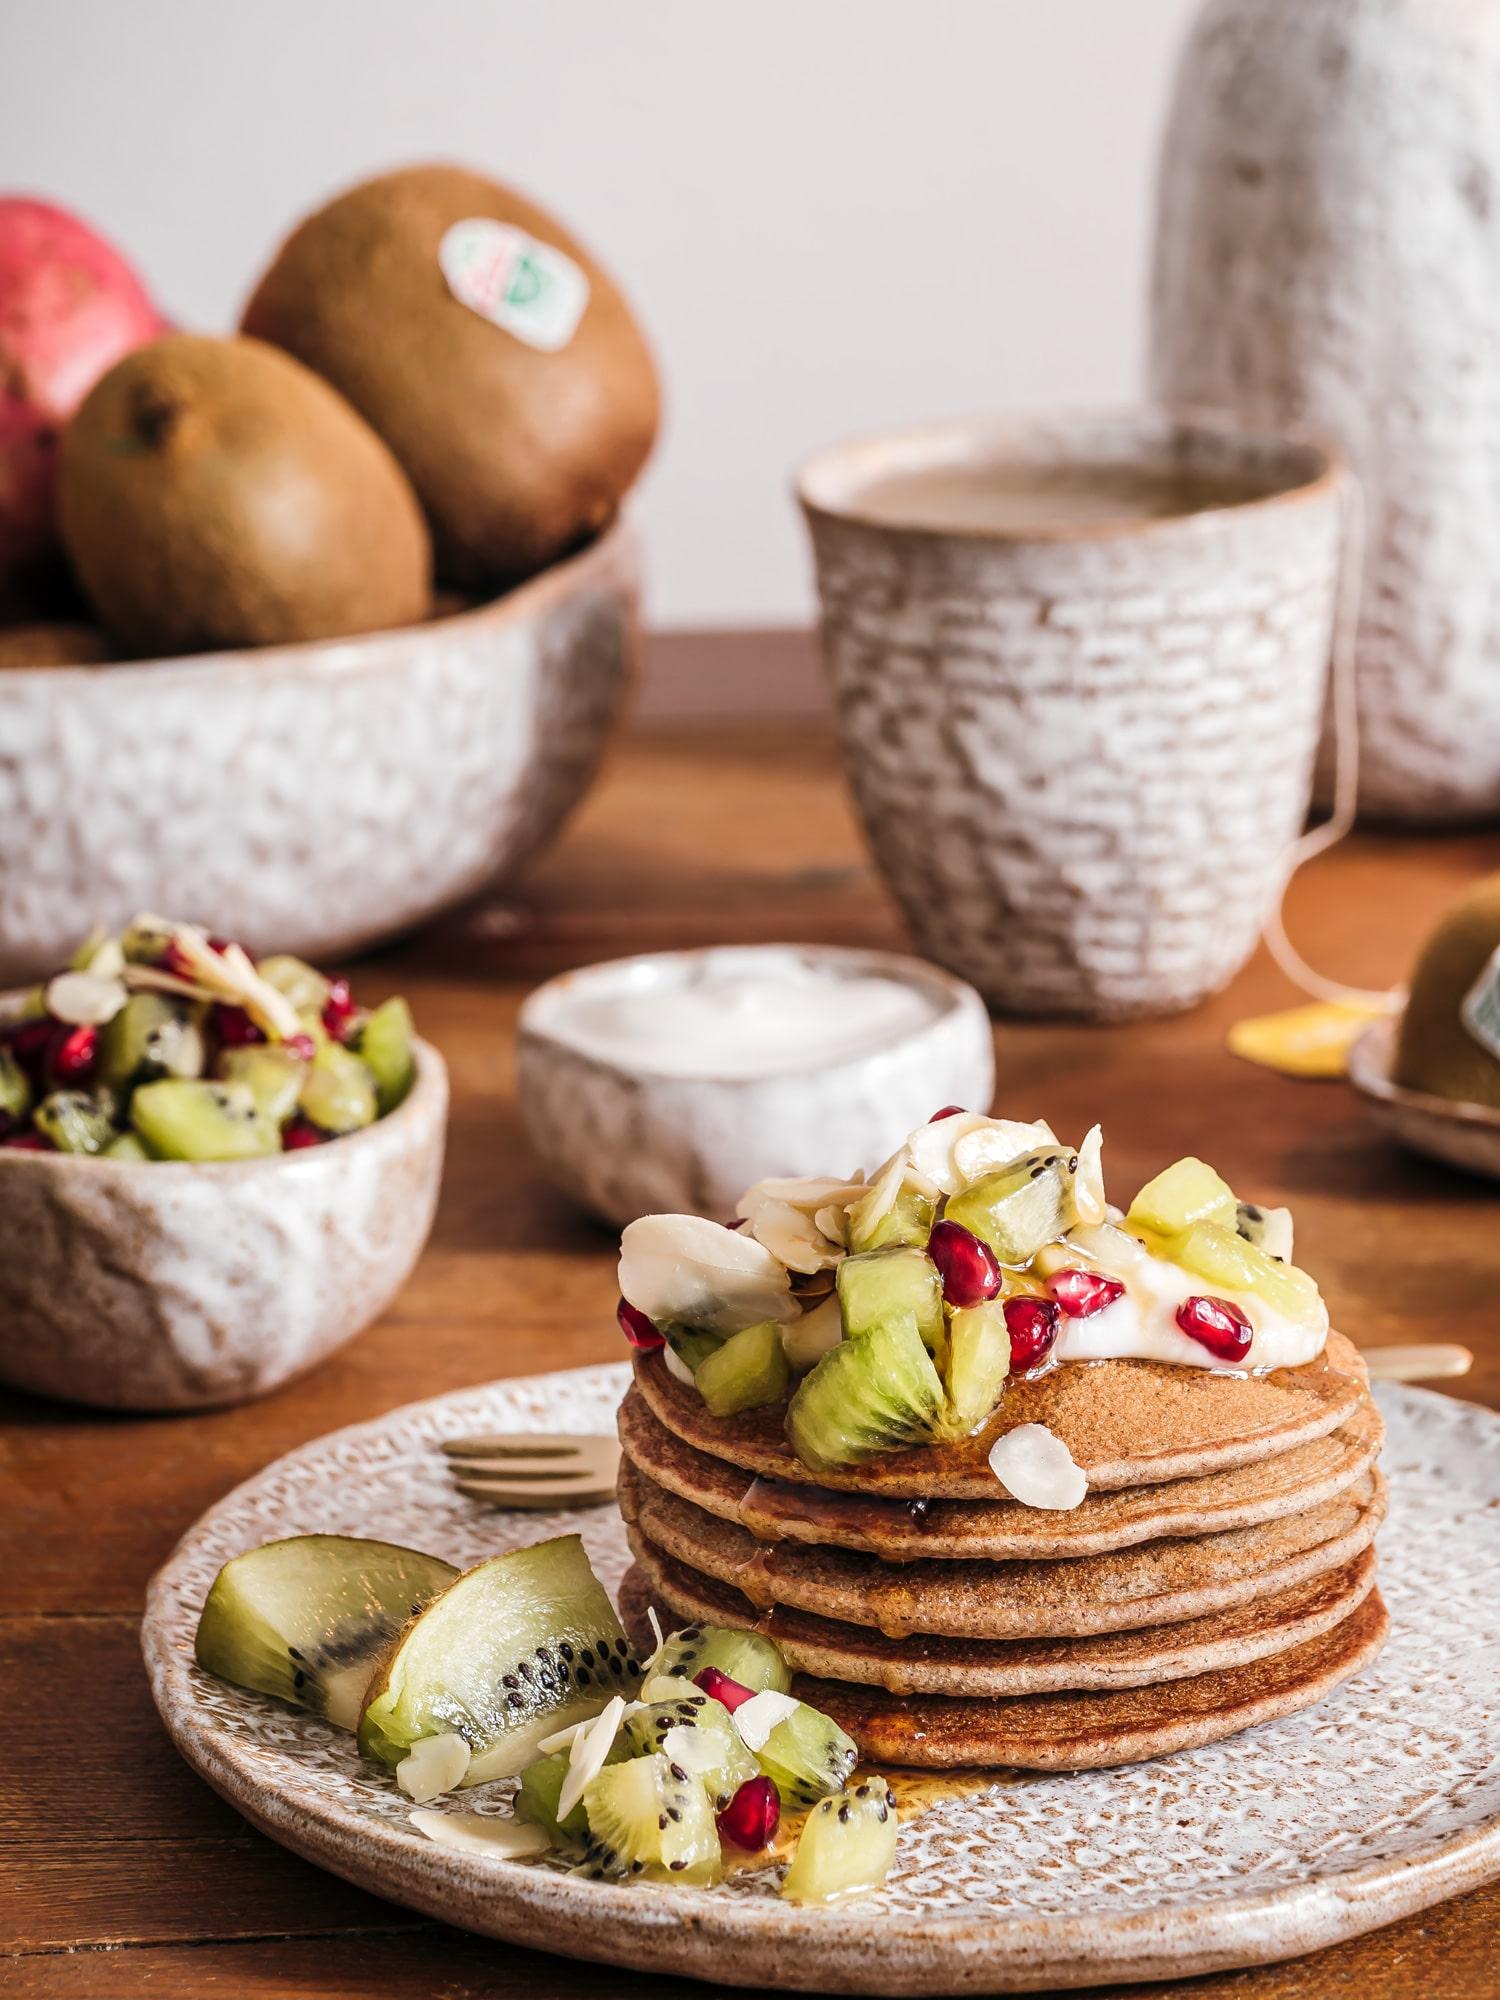 Gesunde Pancakes aus Buchweizen mit Green Kiwi-Granatapfelsalat